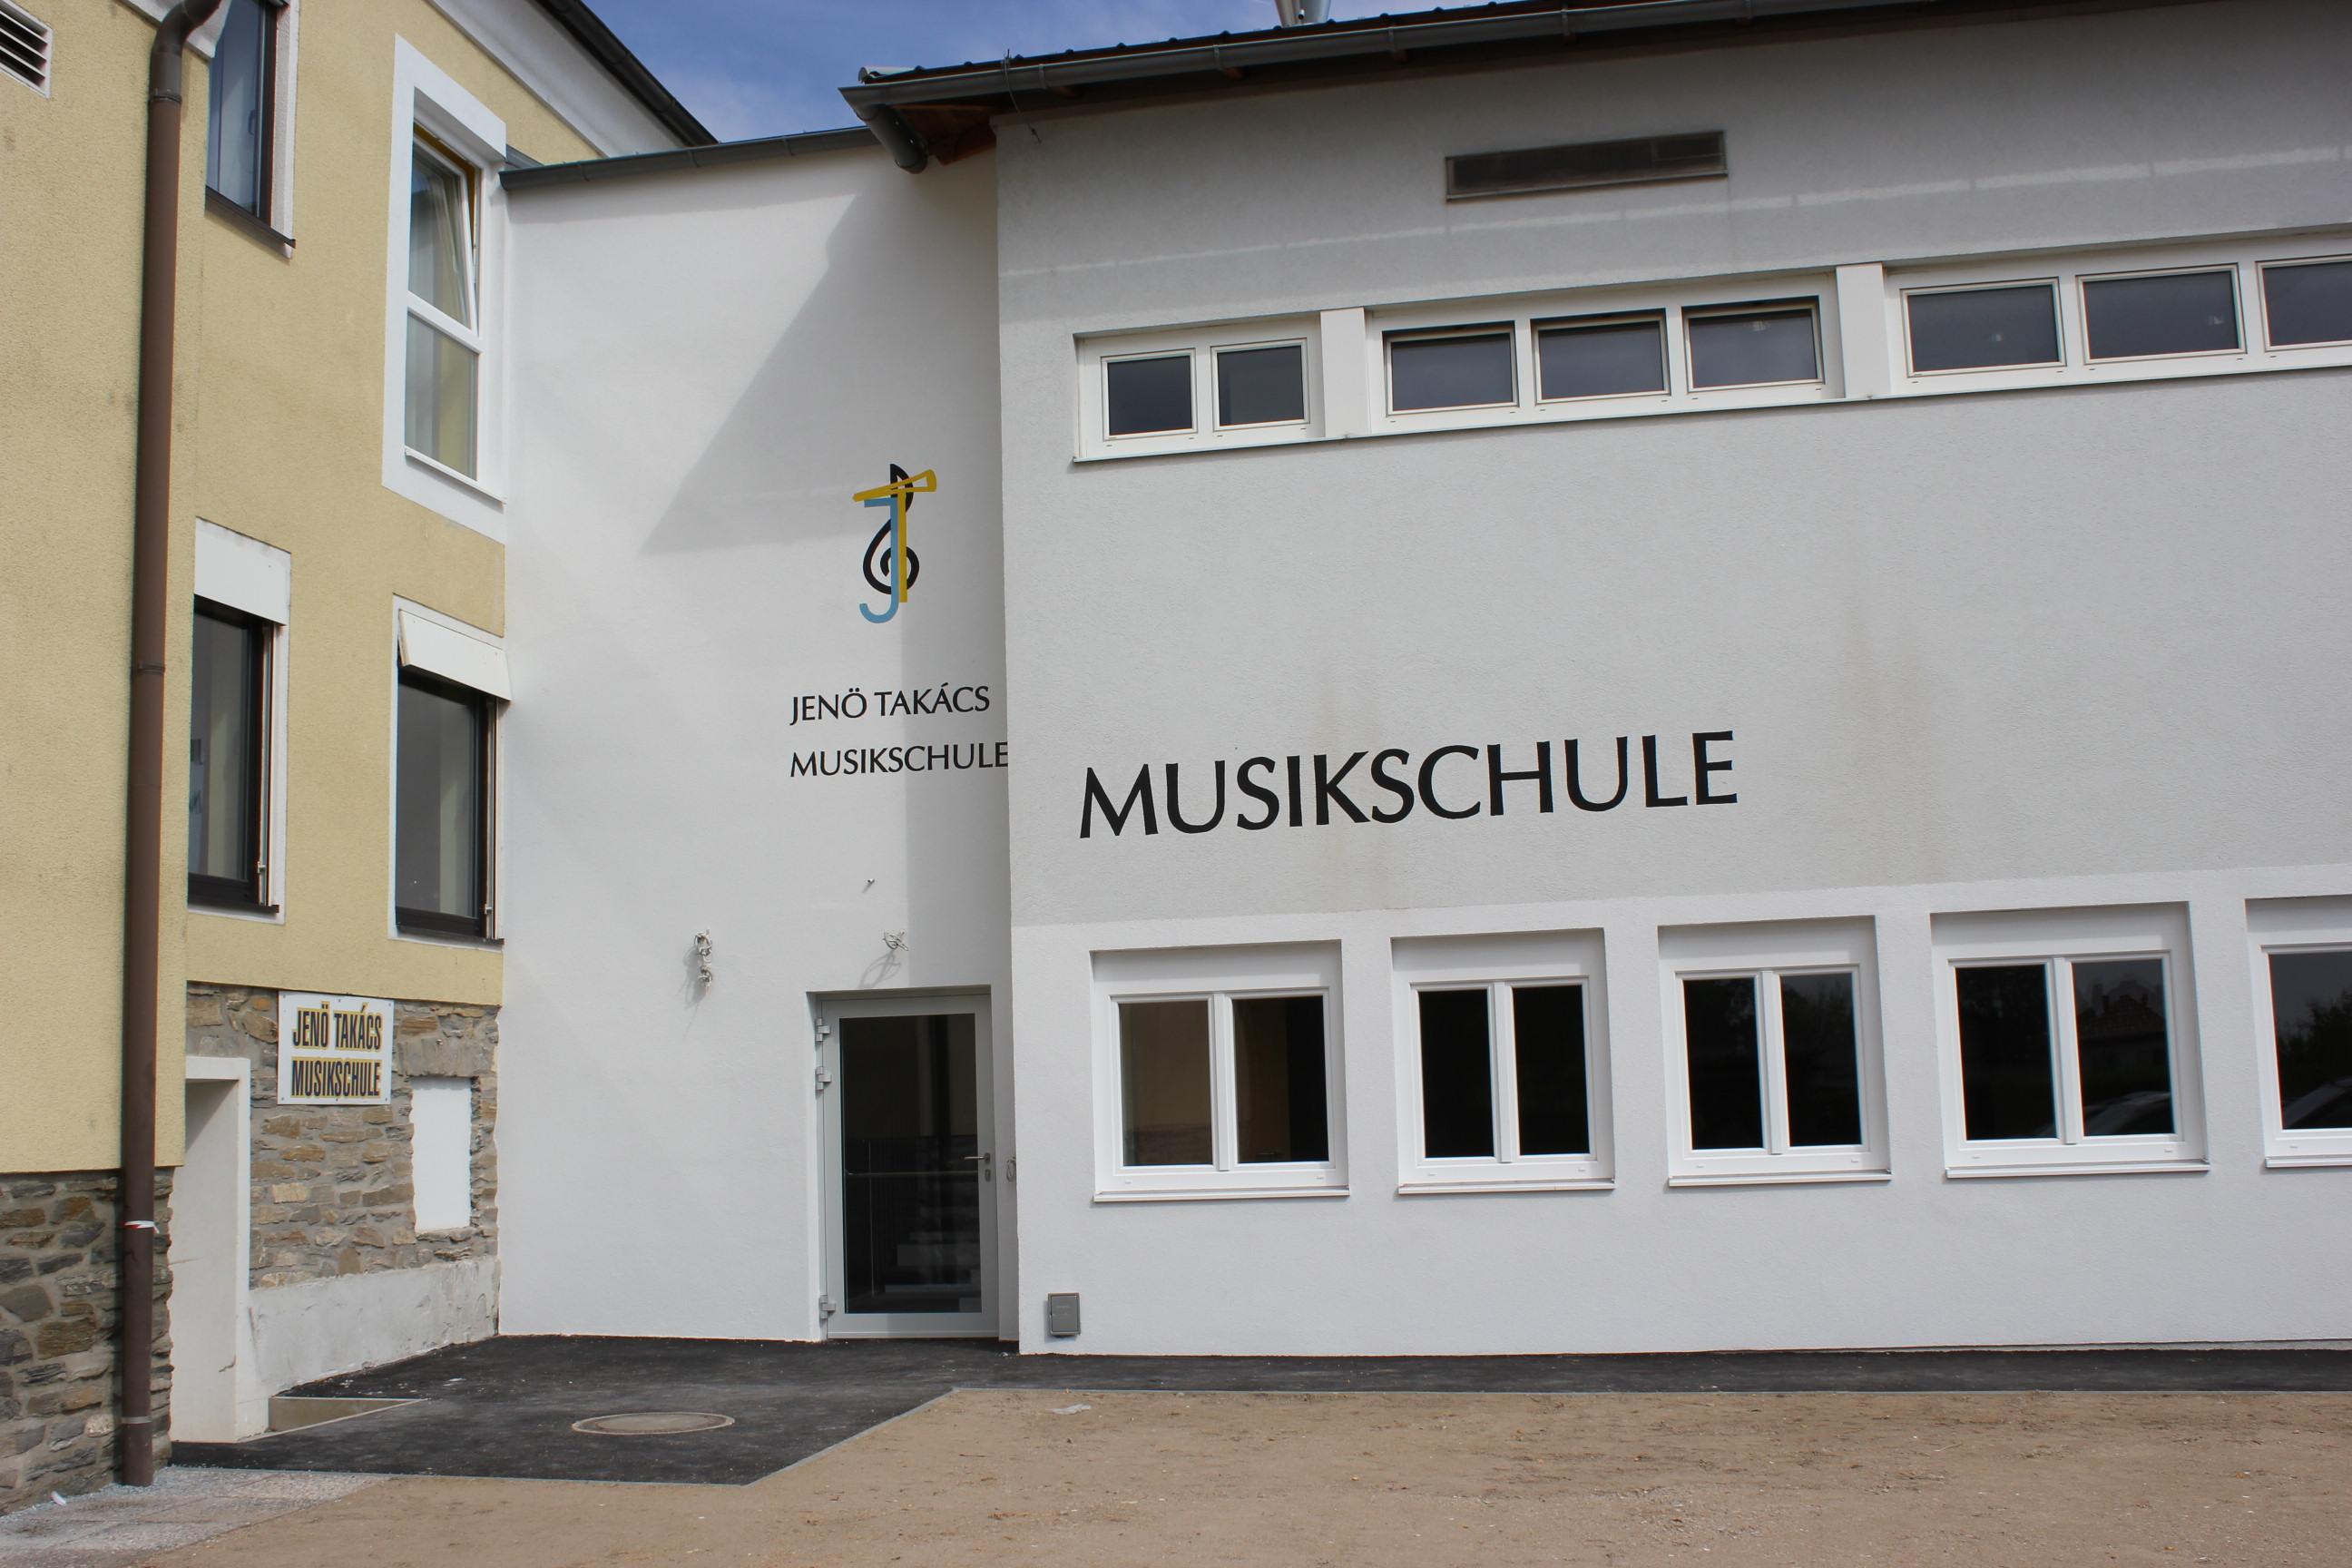 Jenö Takács Musikschule Rechnitz, Südburgenland